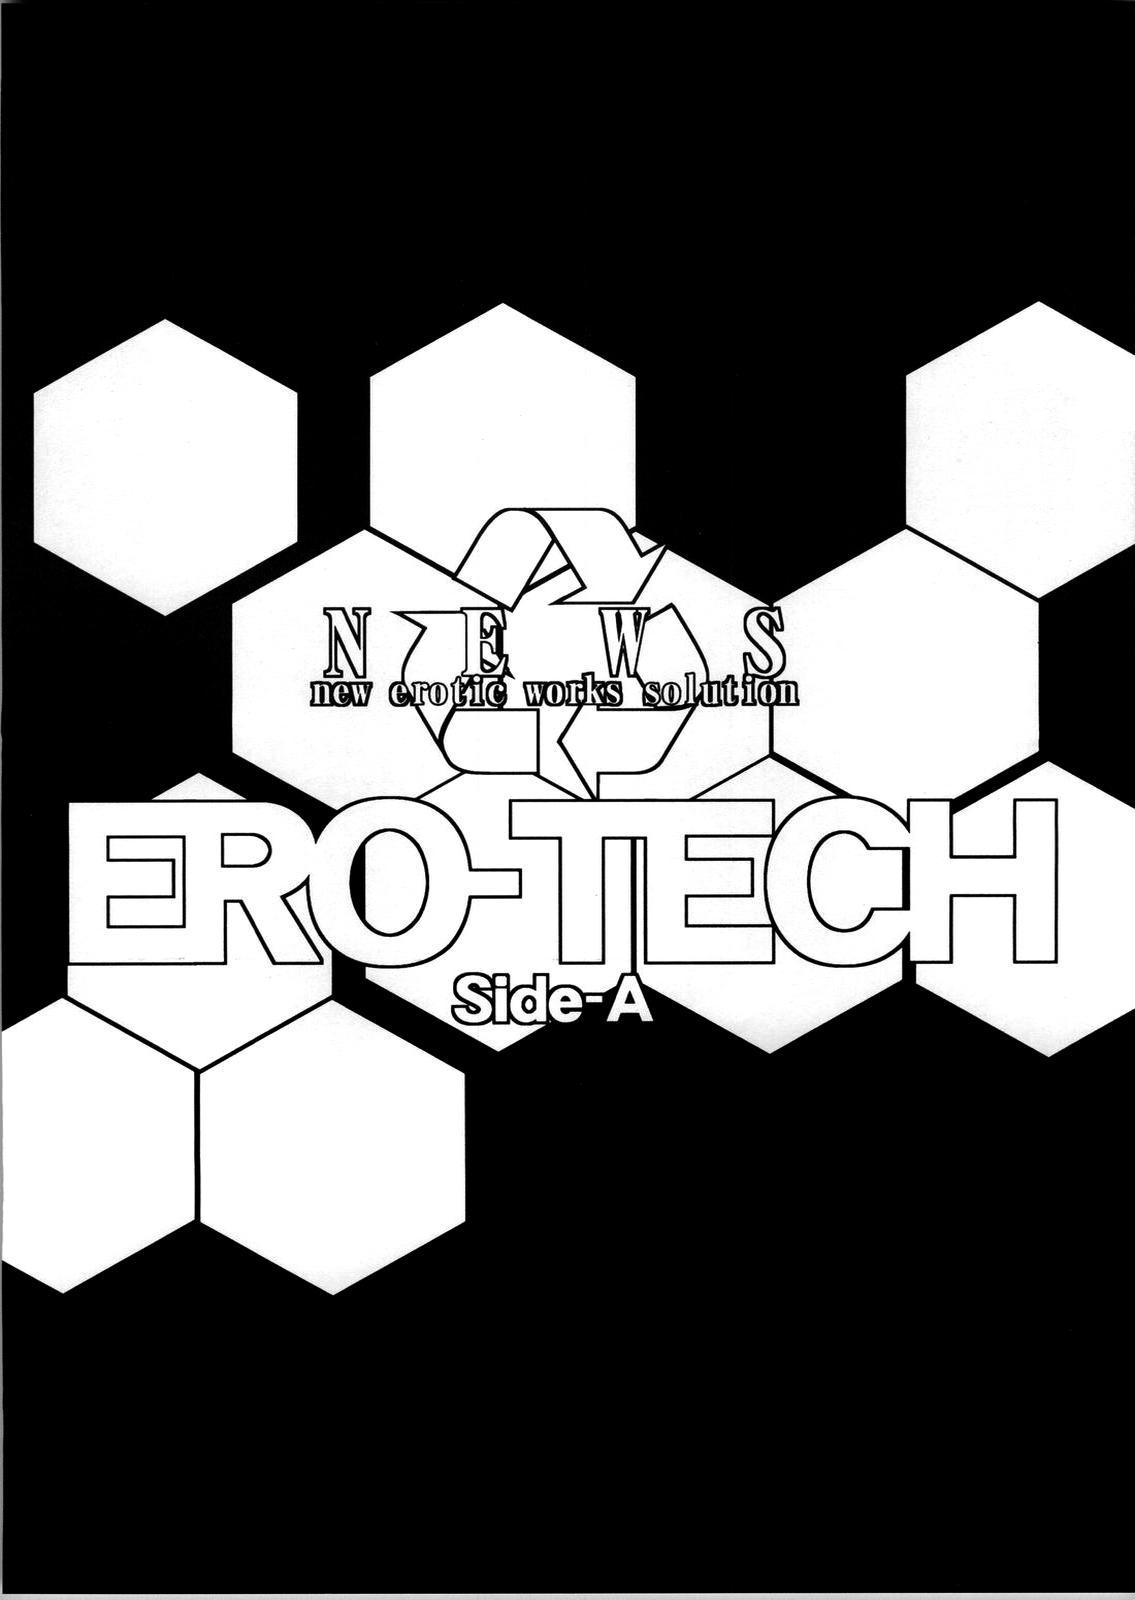 [NEWS (Akow Kazumi, COMA, Yamagata Sei)] ERO-TECH SIDE-A [Textless] 14